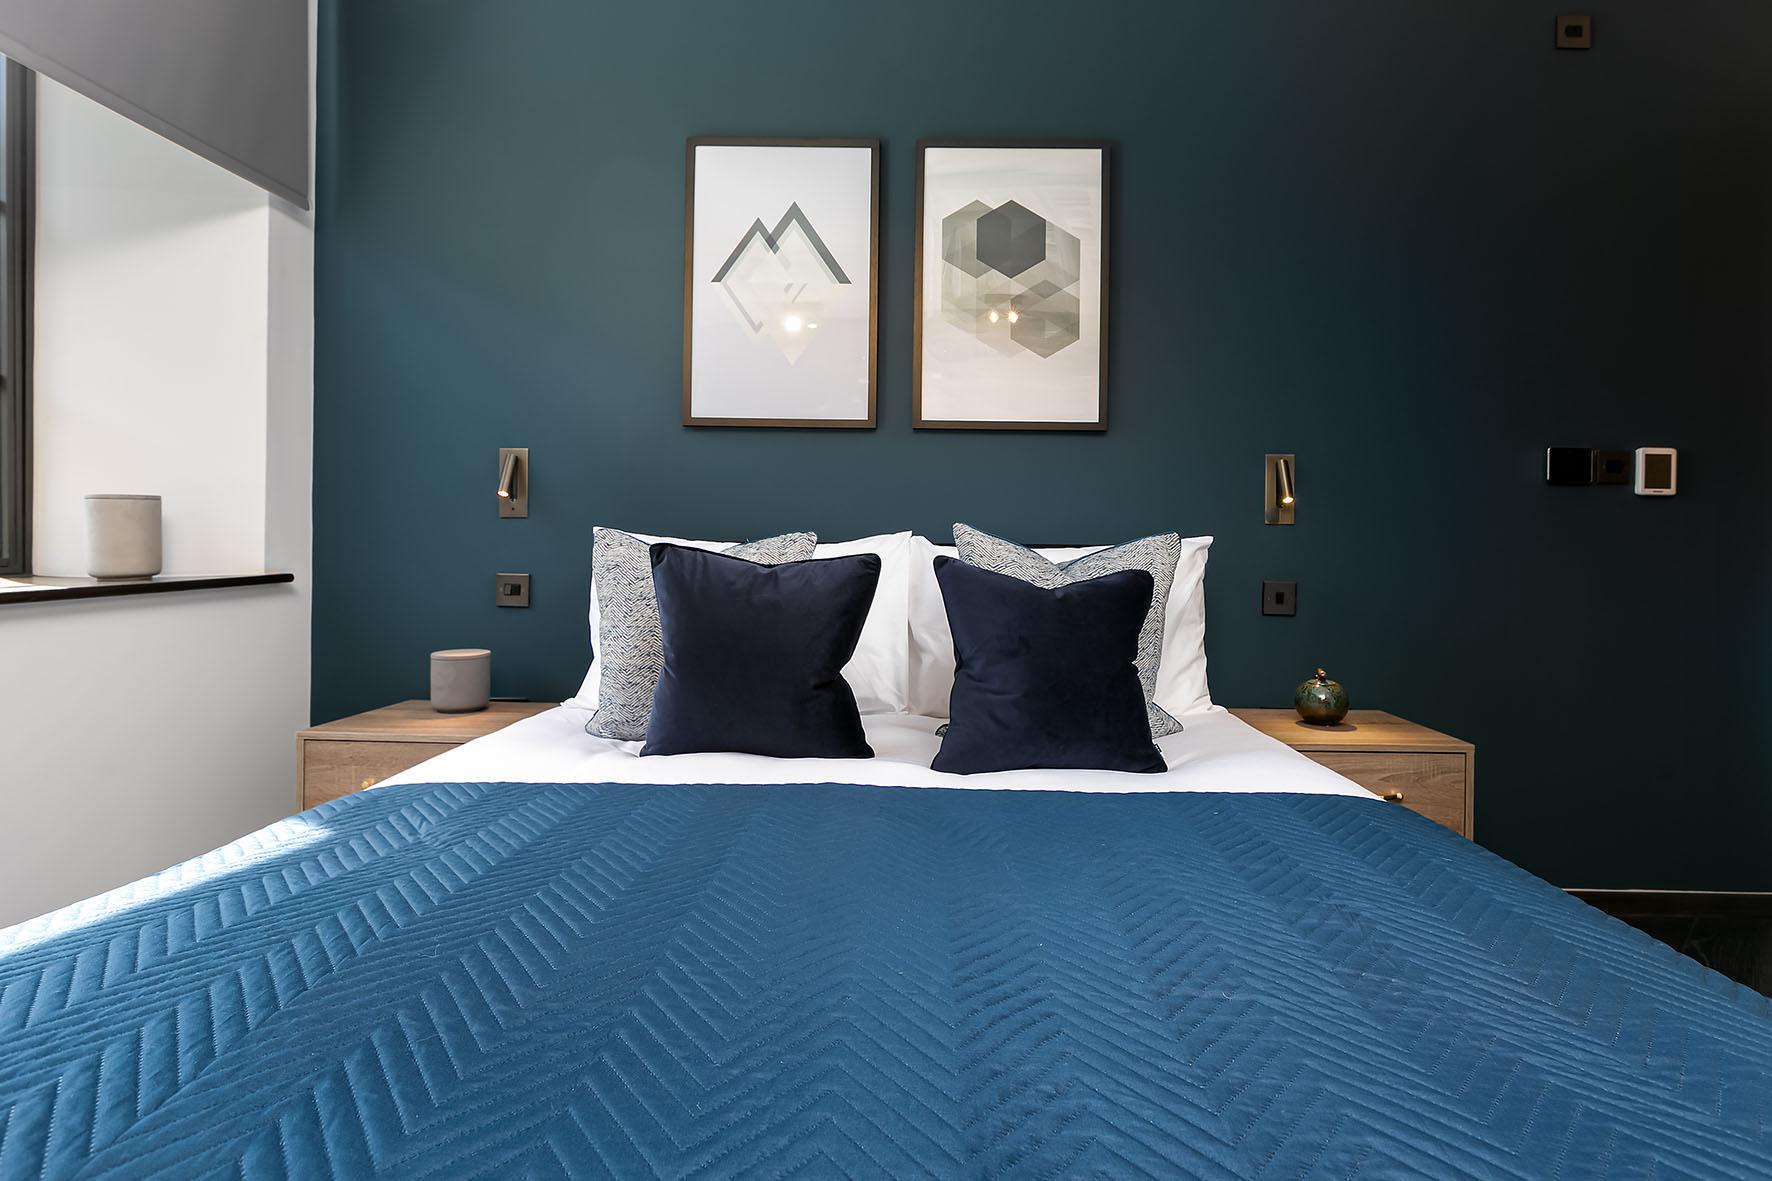 Lovelydays luxury service apartment rental - London - Soho - Oxford Street IV - Lovelysuite - 2 bedrooms - 2 bathrooms - Queen bed - dc8aa880e281 - Lovelydays